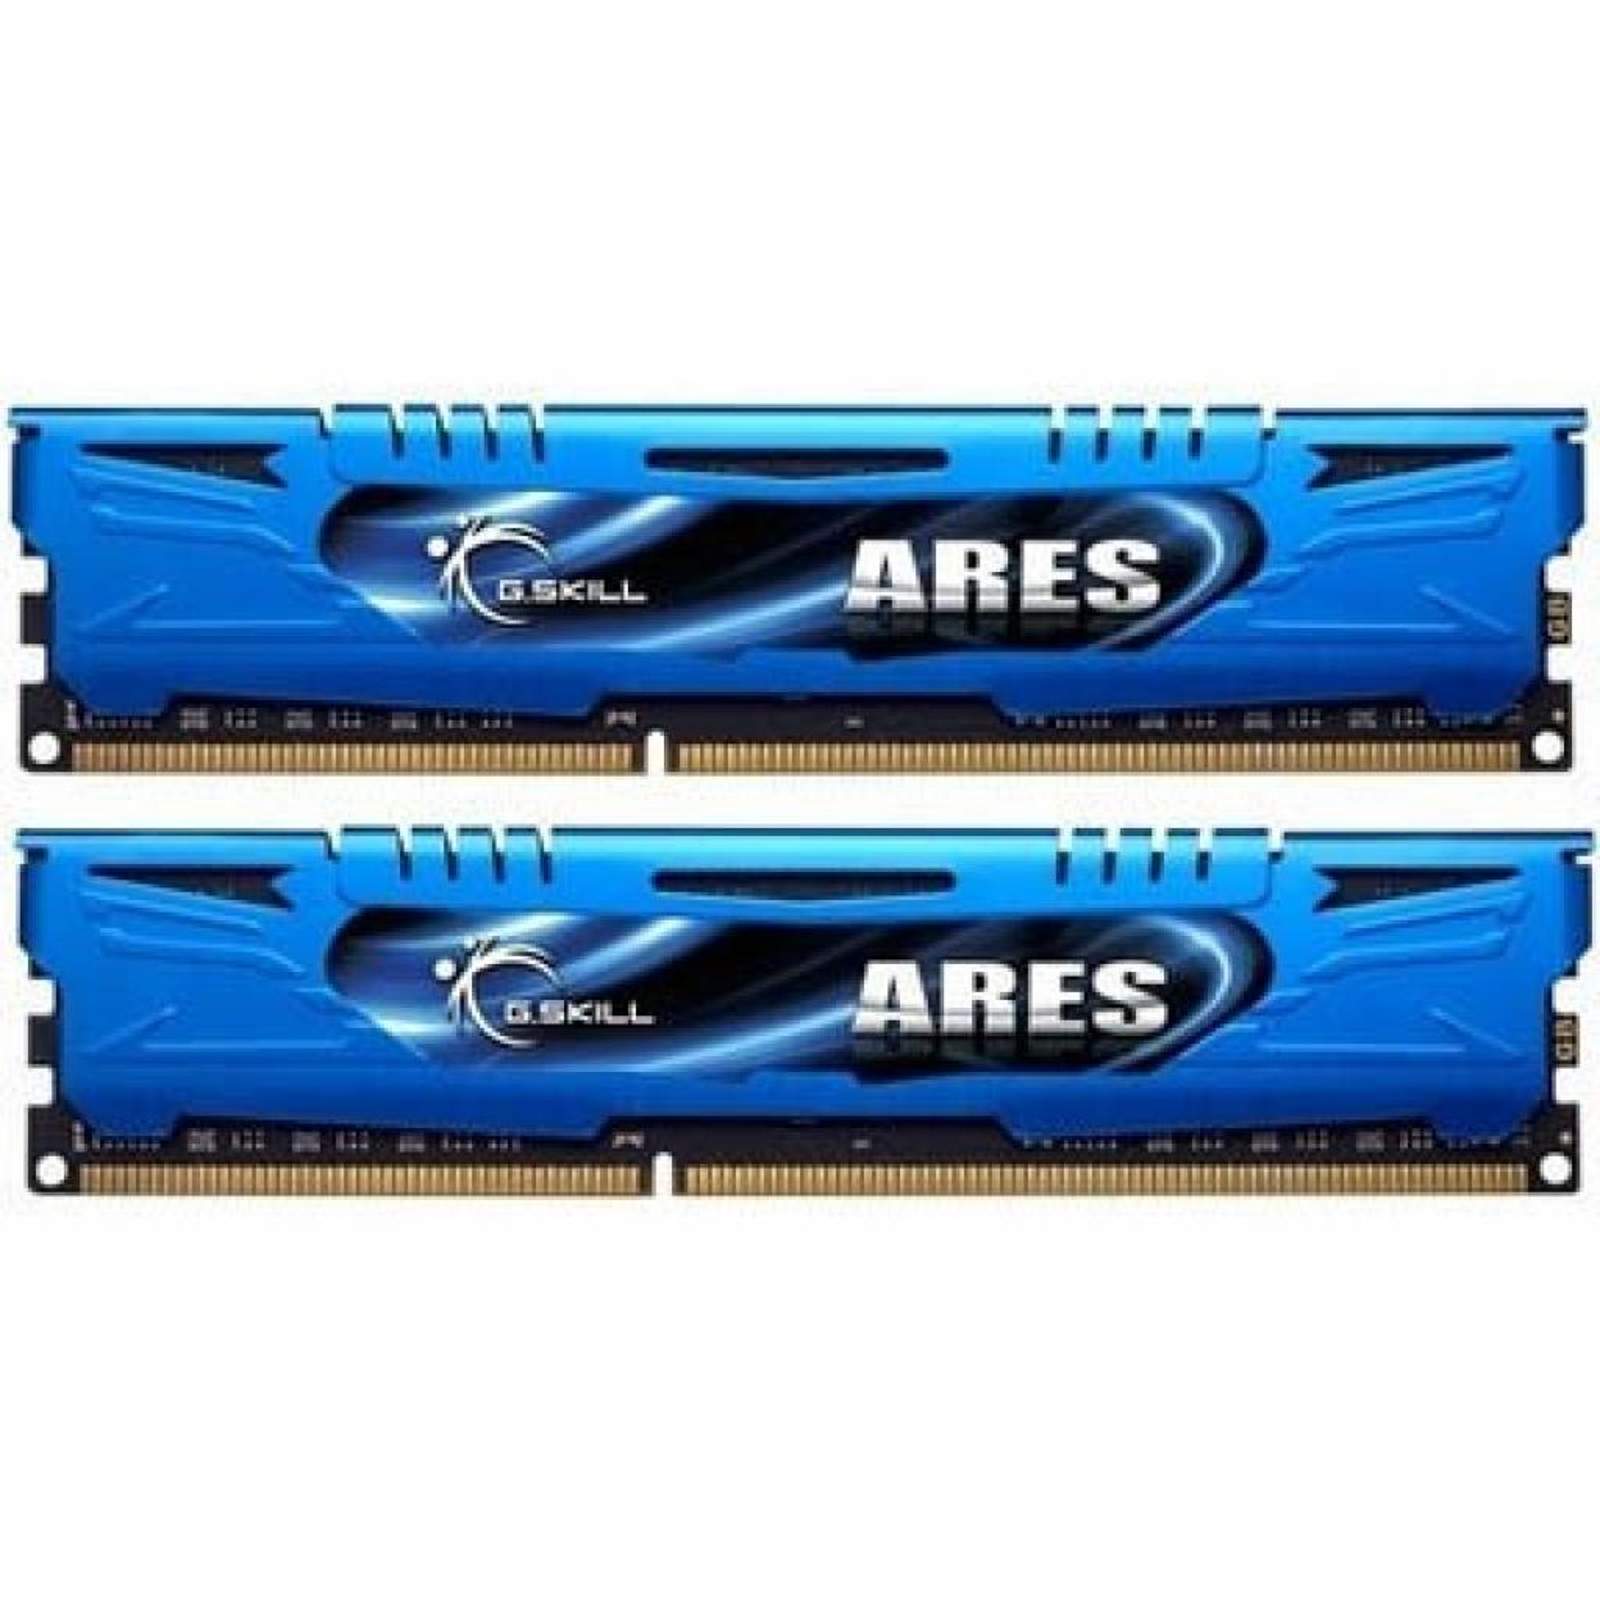 Модуль памяти для компьютера DDR3 8GB (2x4GB) 2133 MHz G.Skill (F3-2133C10D-8GAB)